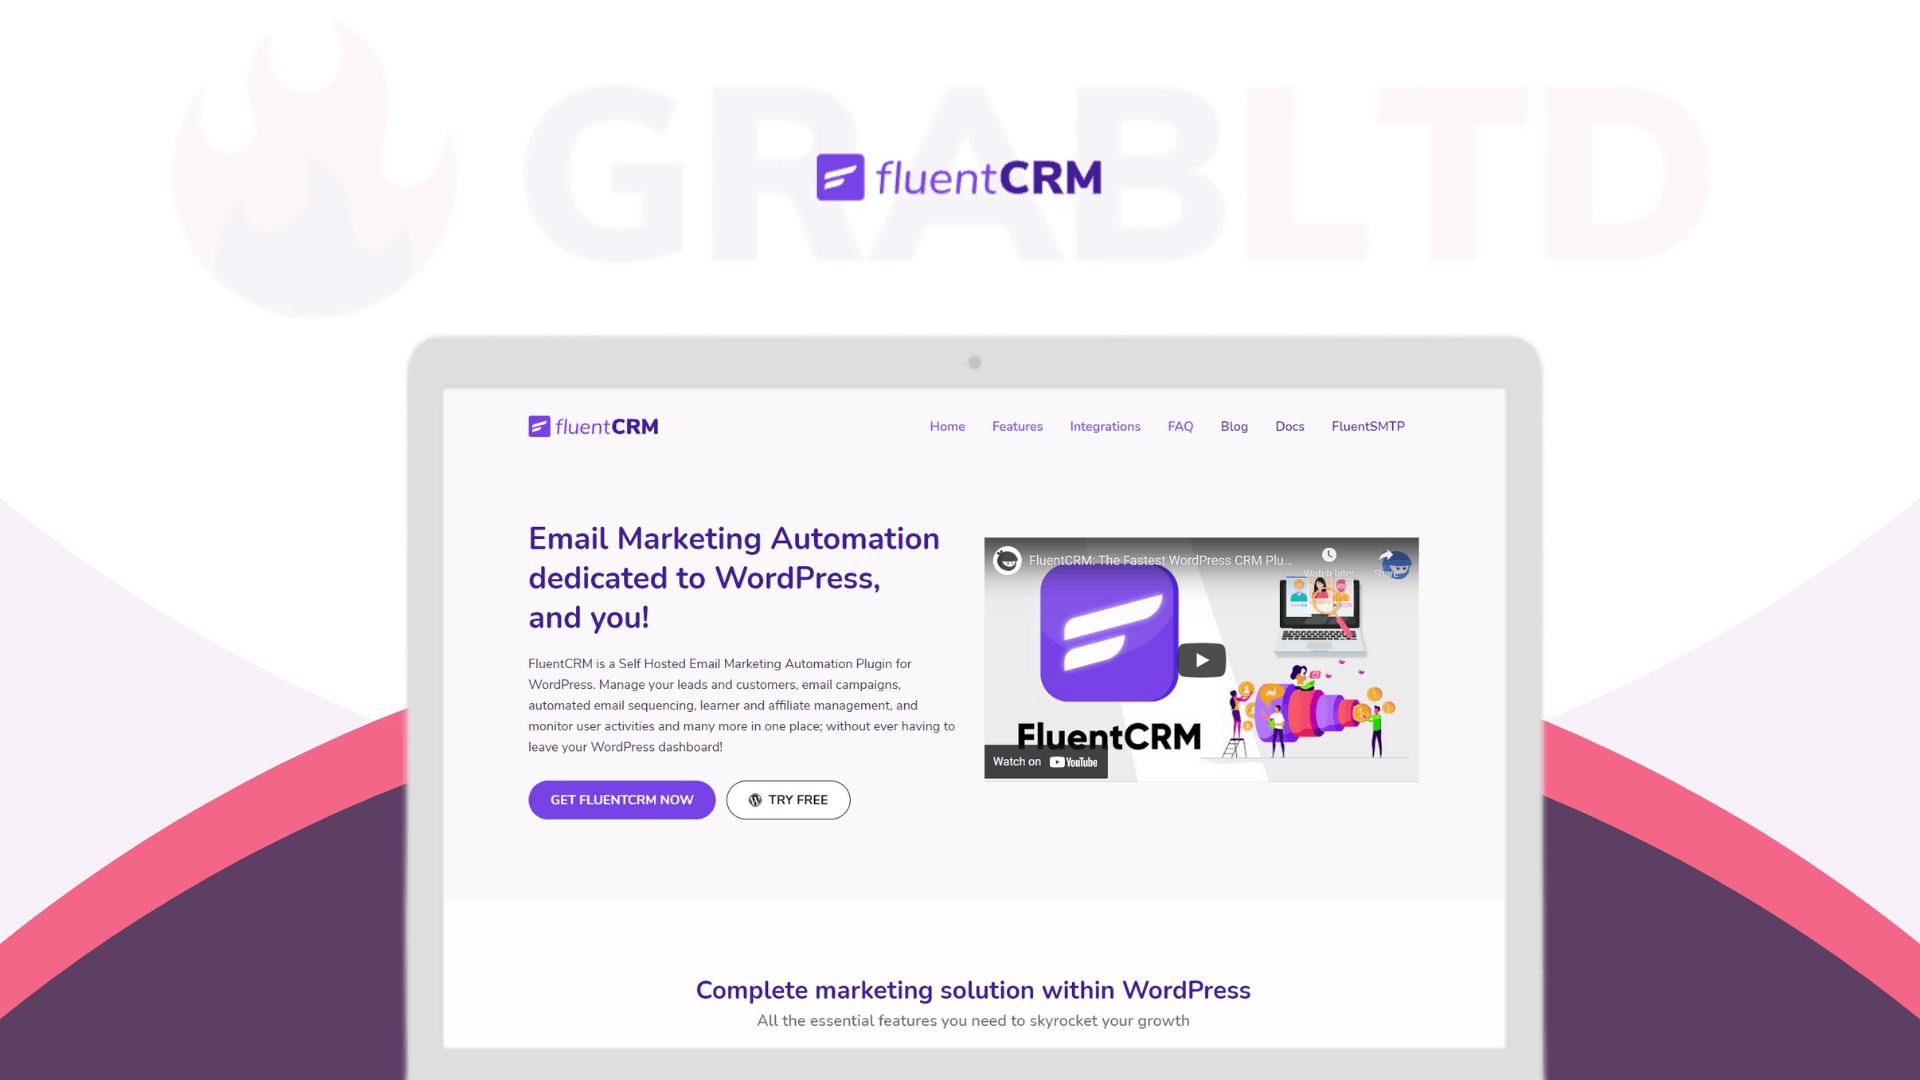 FluentCRM Lifetime Software Deal